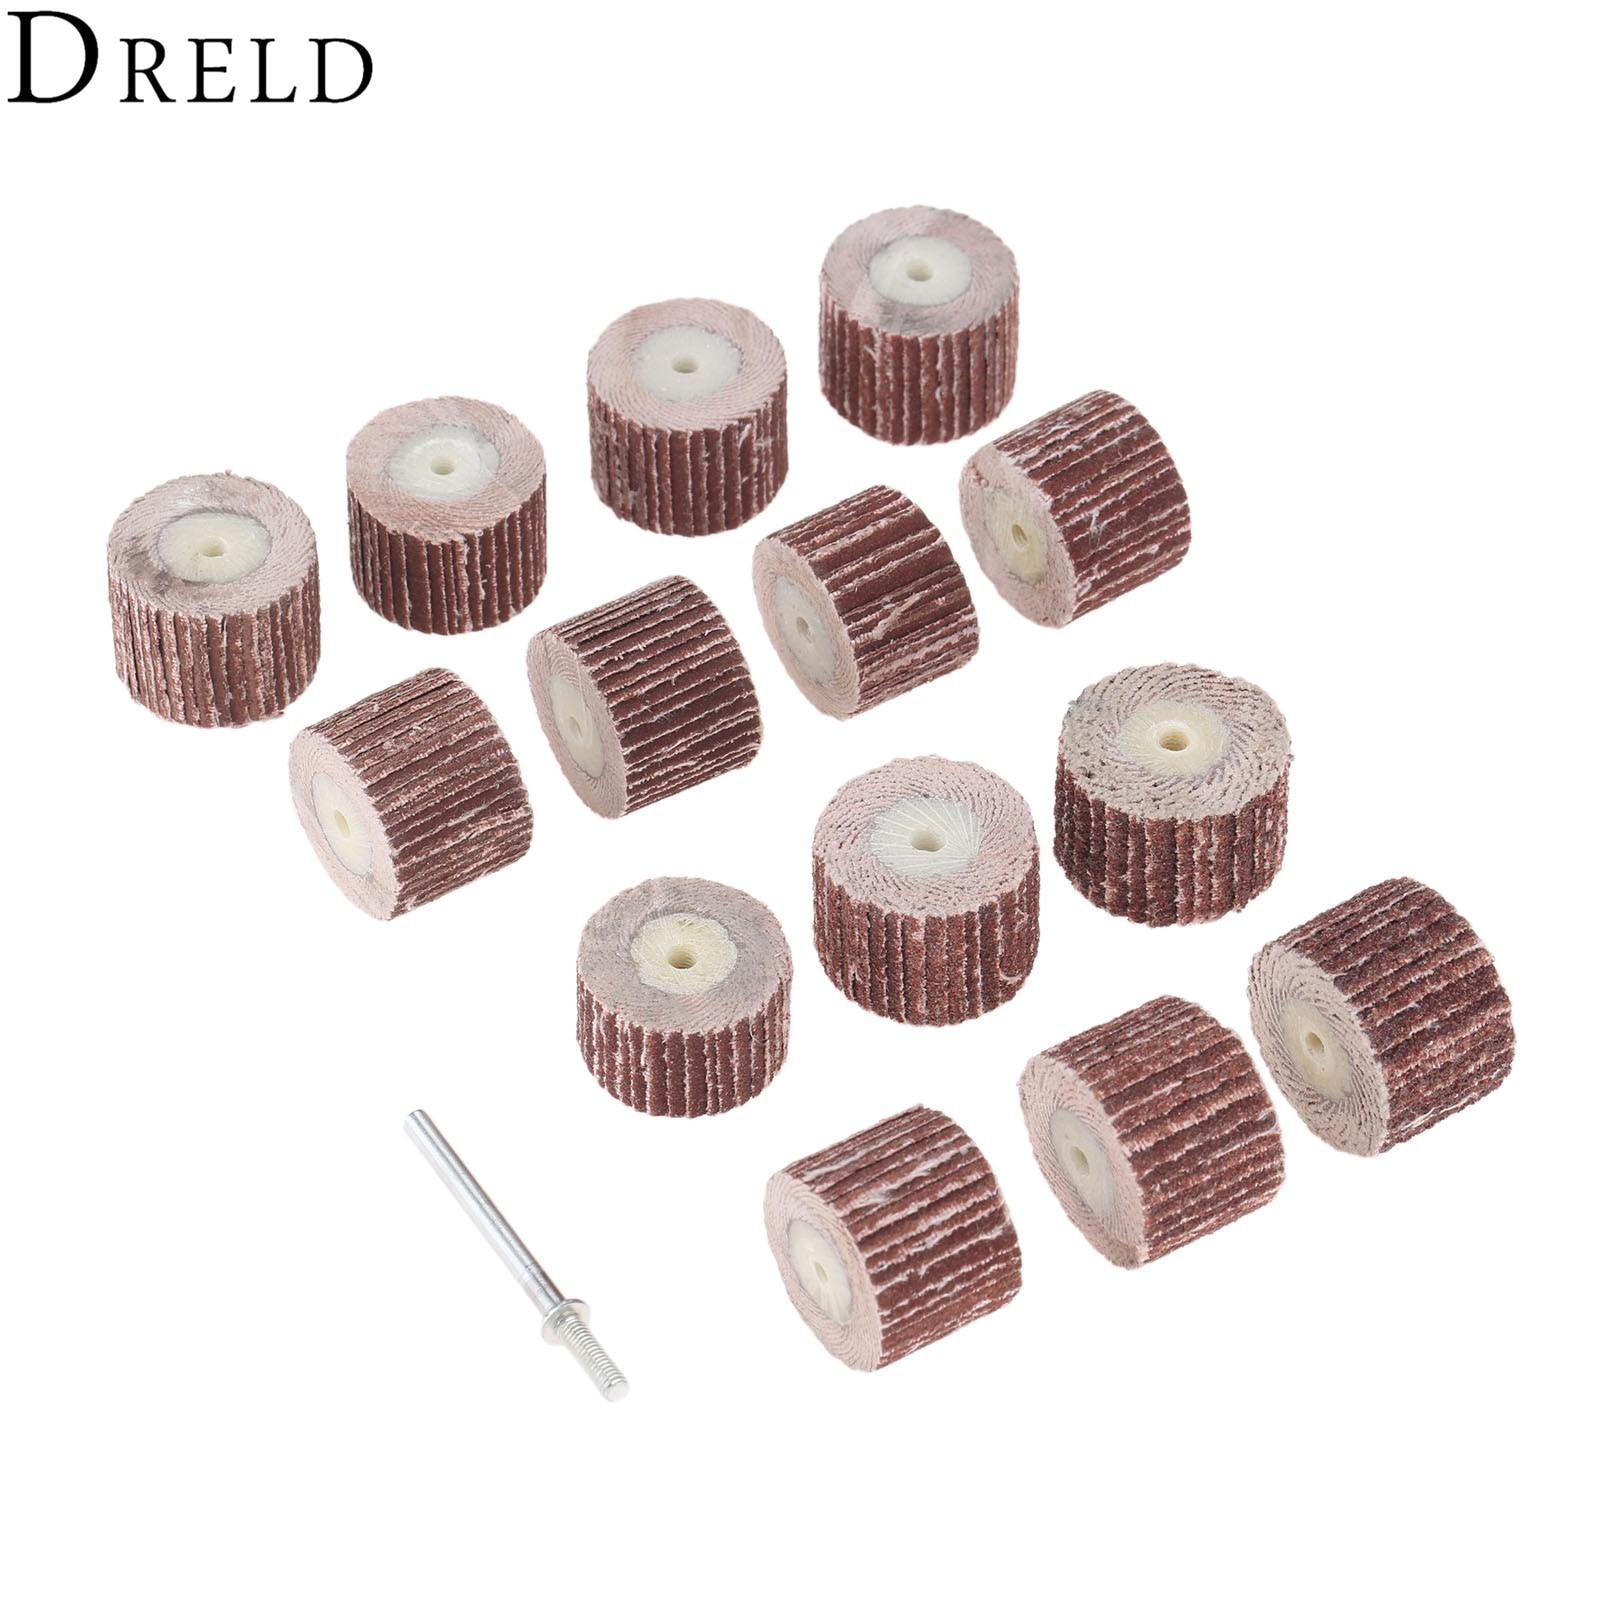 DRELD 10Pcs Dremel Accessories 20mm Grinding Sanindg Flap Wheel Brushes For Rotary Mini Drill Polish Tool With Mandrel 3mm Shank